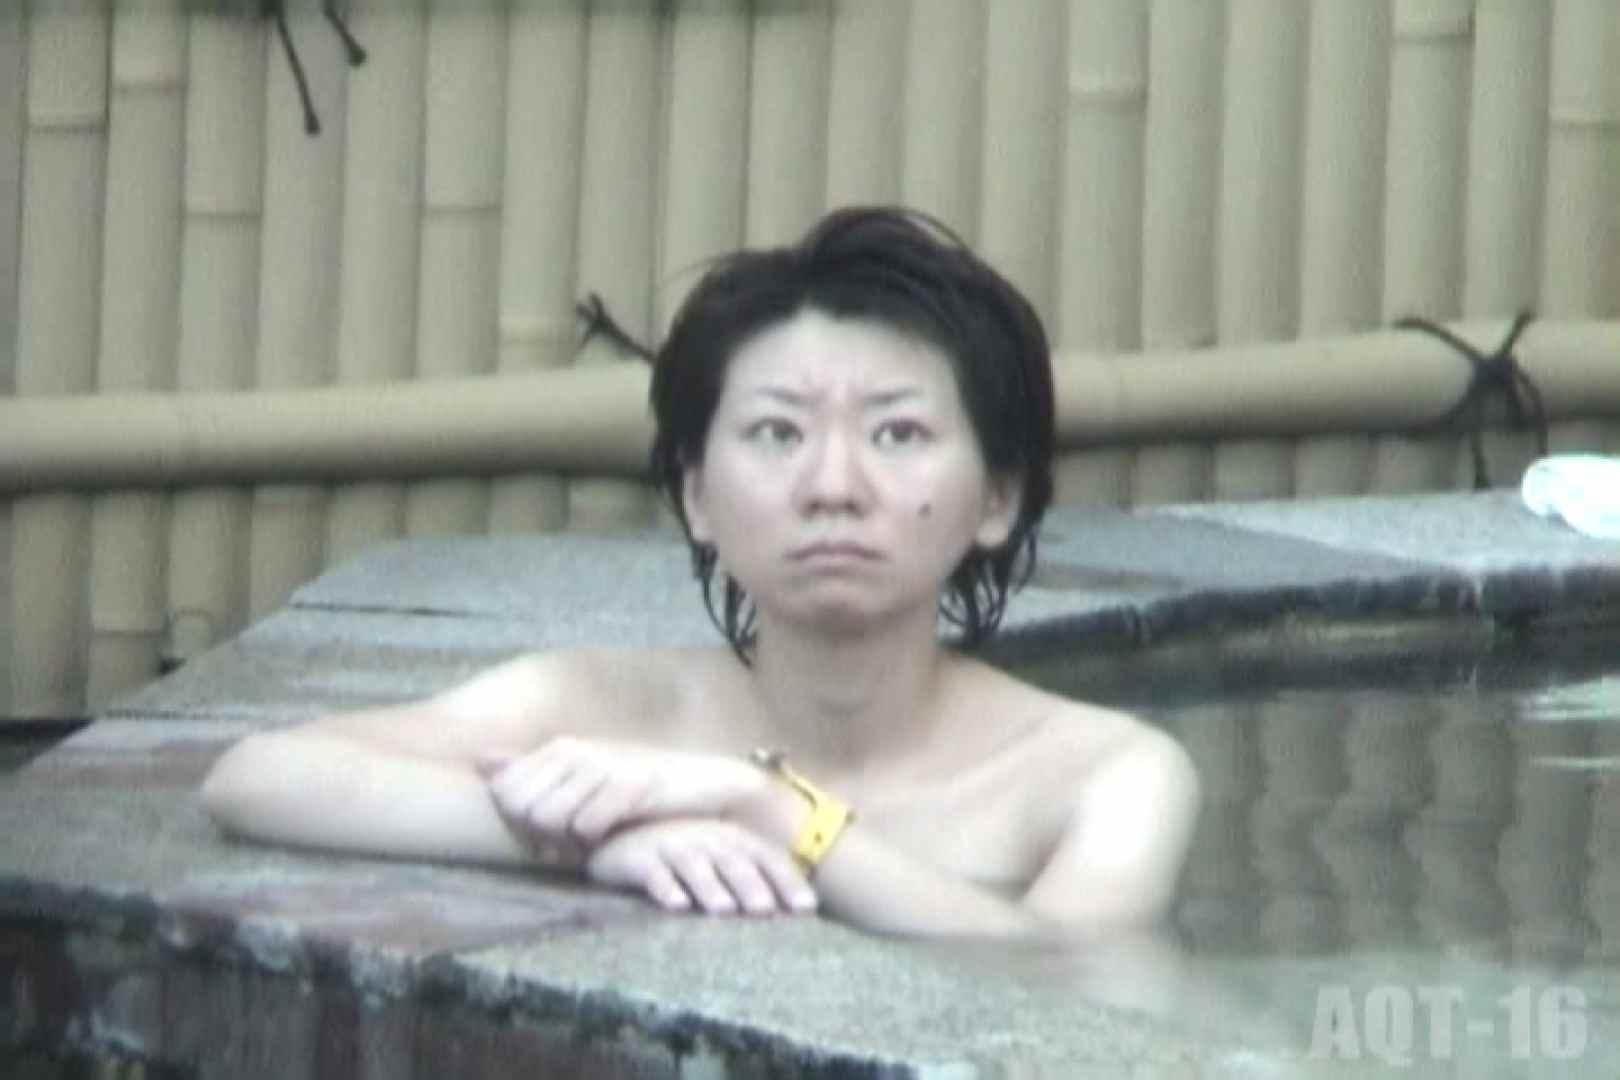 Aquaな露天風呂Vol.842 露天風呂突入 AV動画キャプチャ 96pic 83